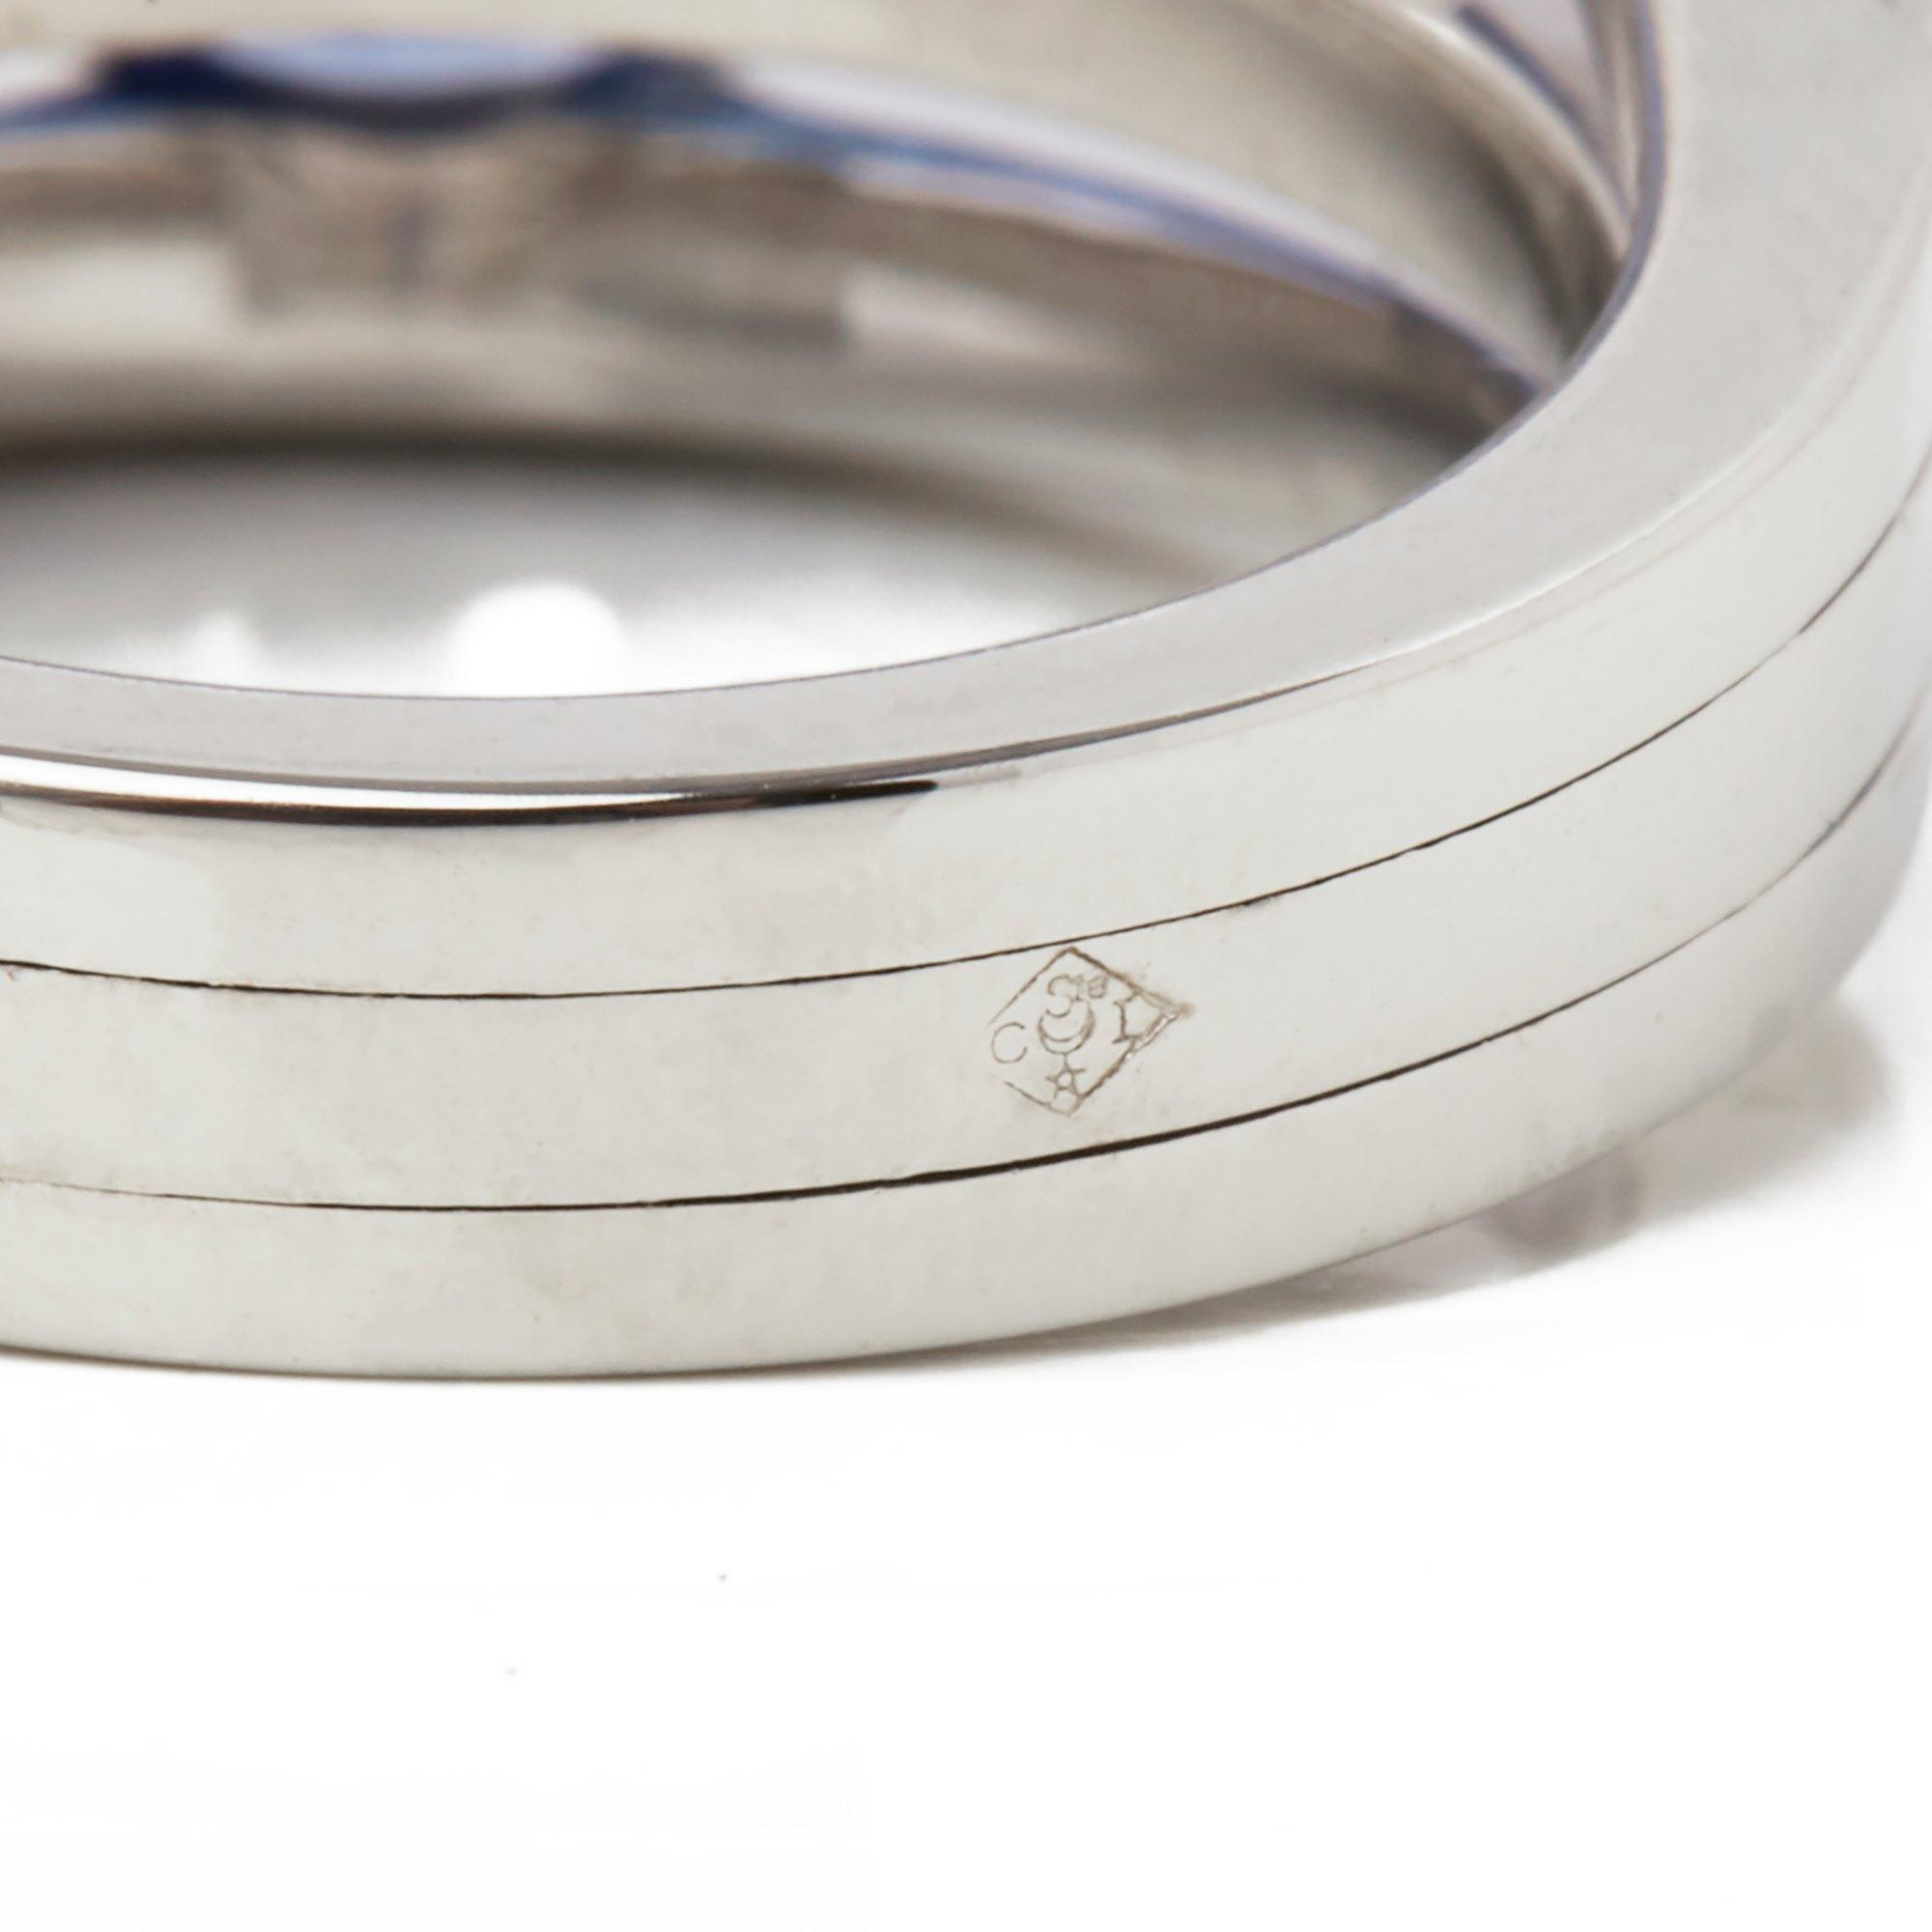 Chaumet 18k White Gold Sapphire & Diamond Ring